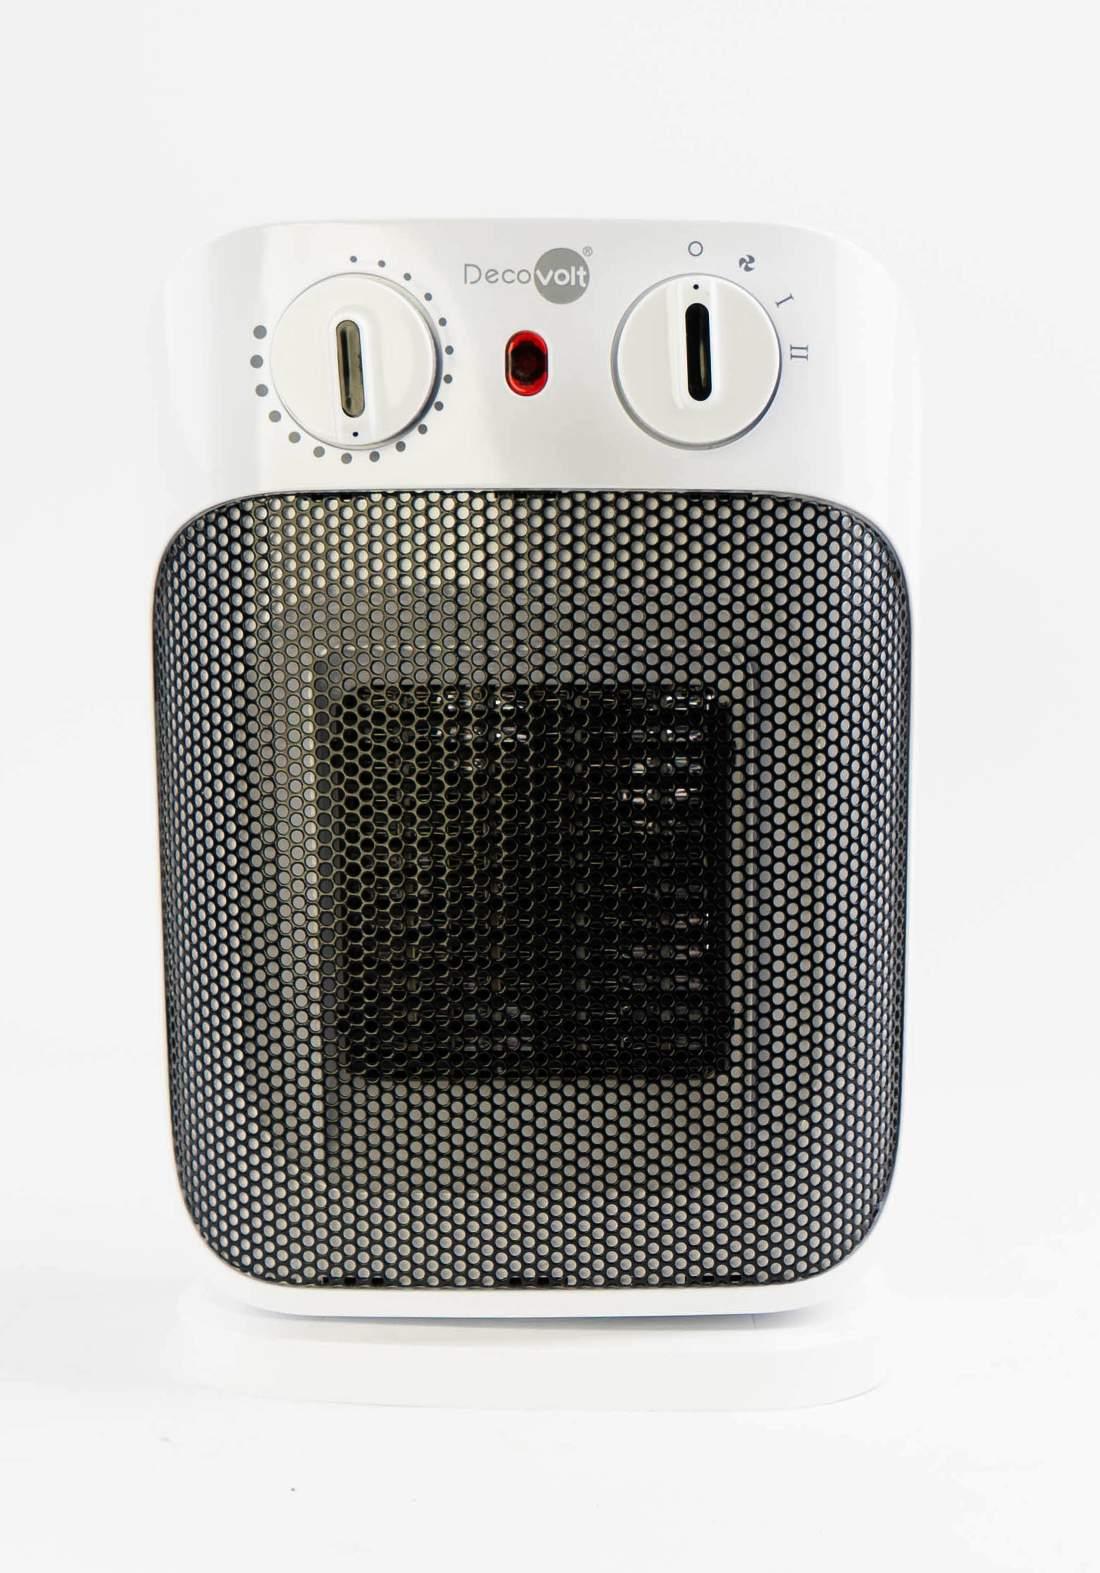 DecoVolt 5663 Rotary Tabletop Heater Fan 1800 w مدفئة 1800 واط مروحة